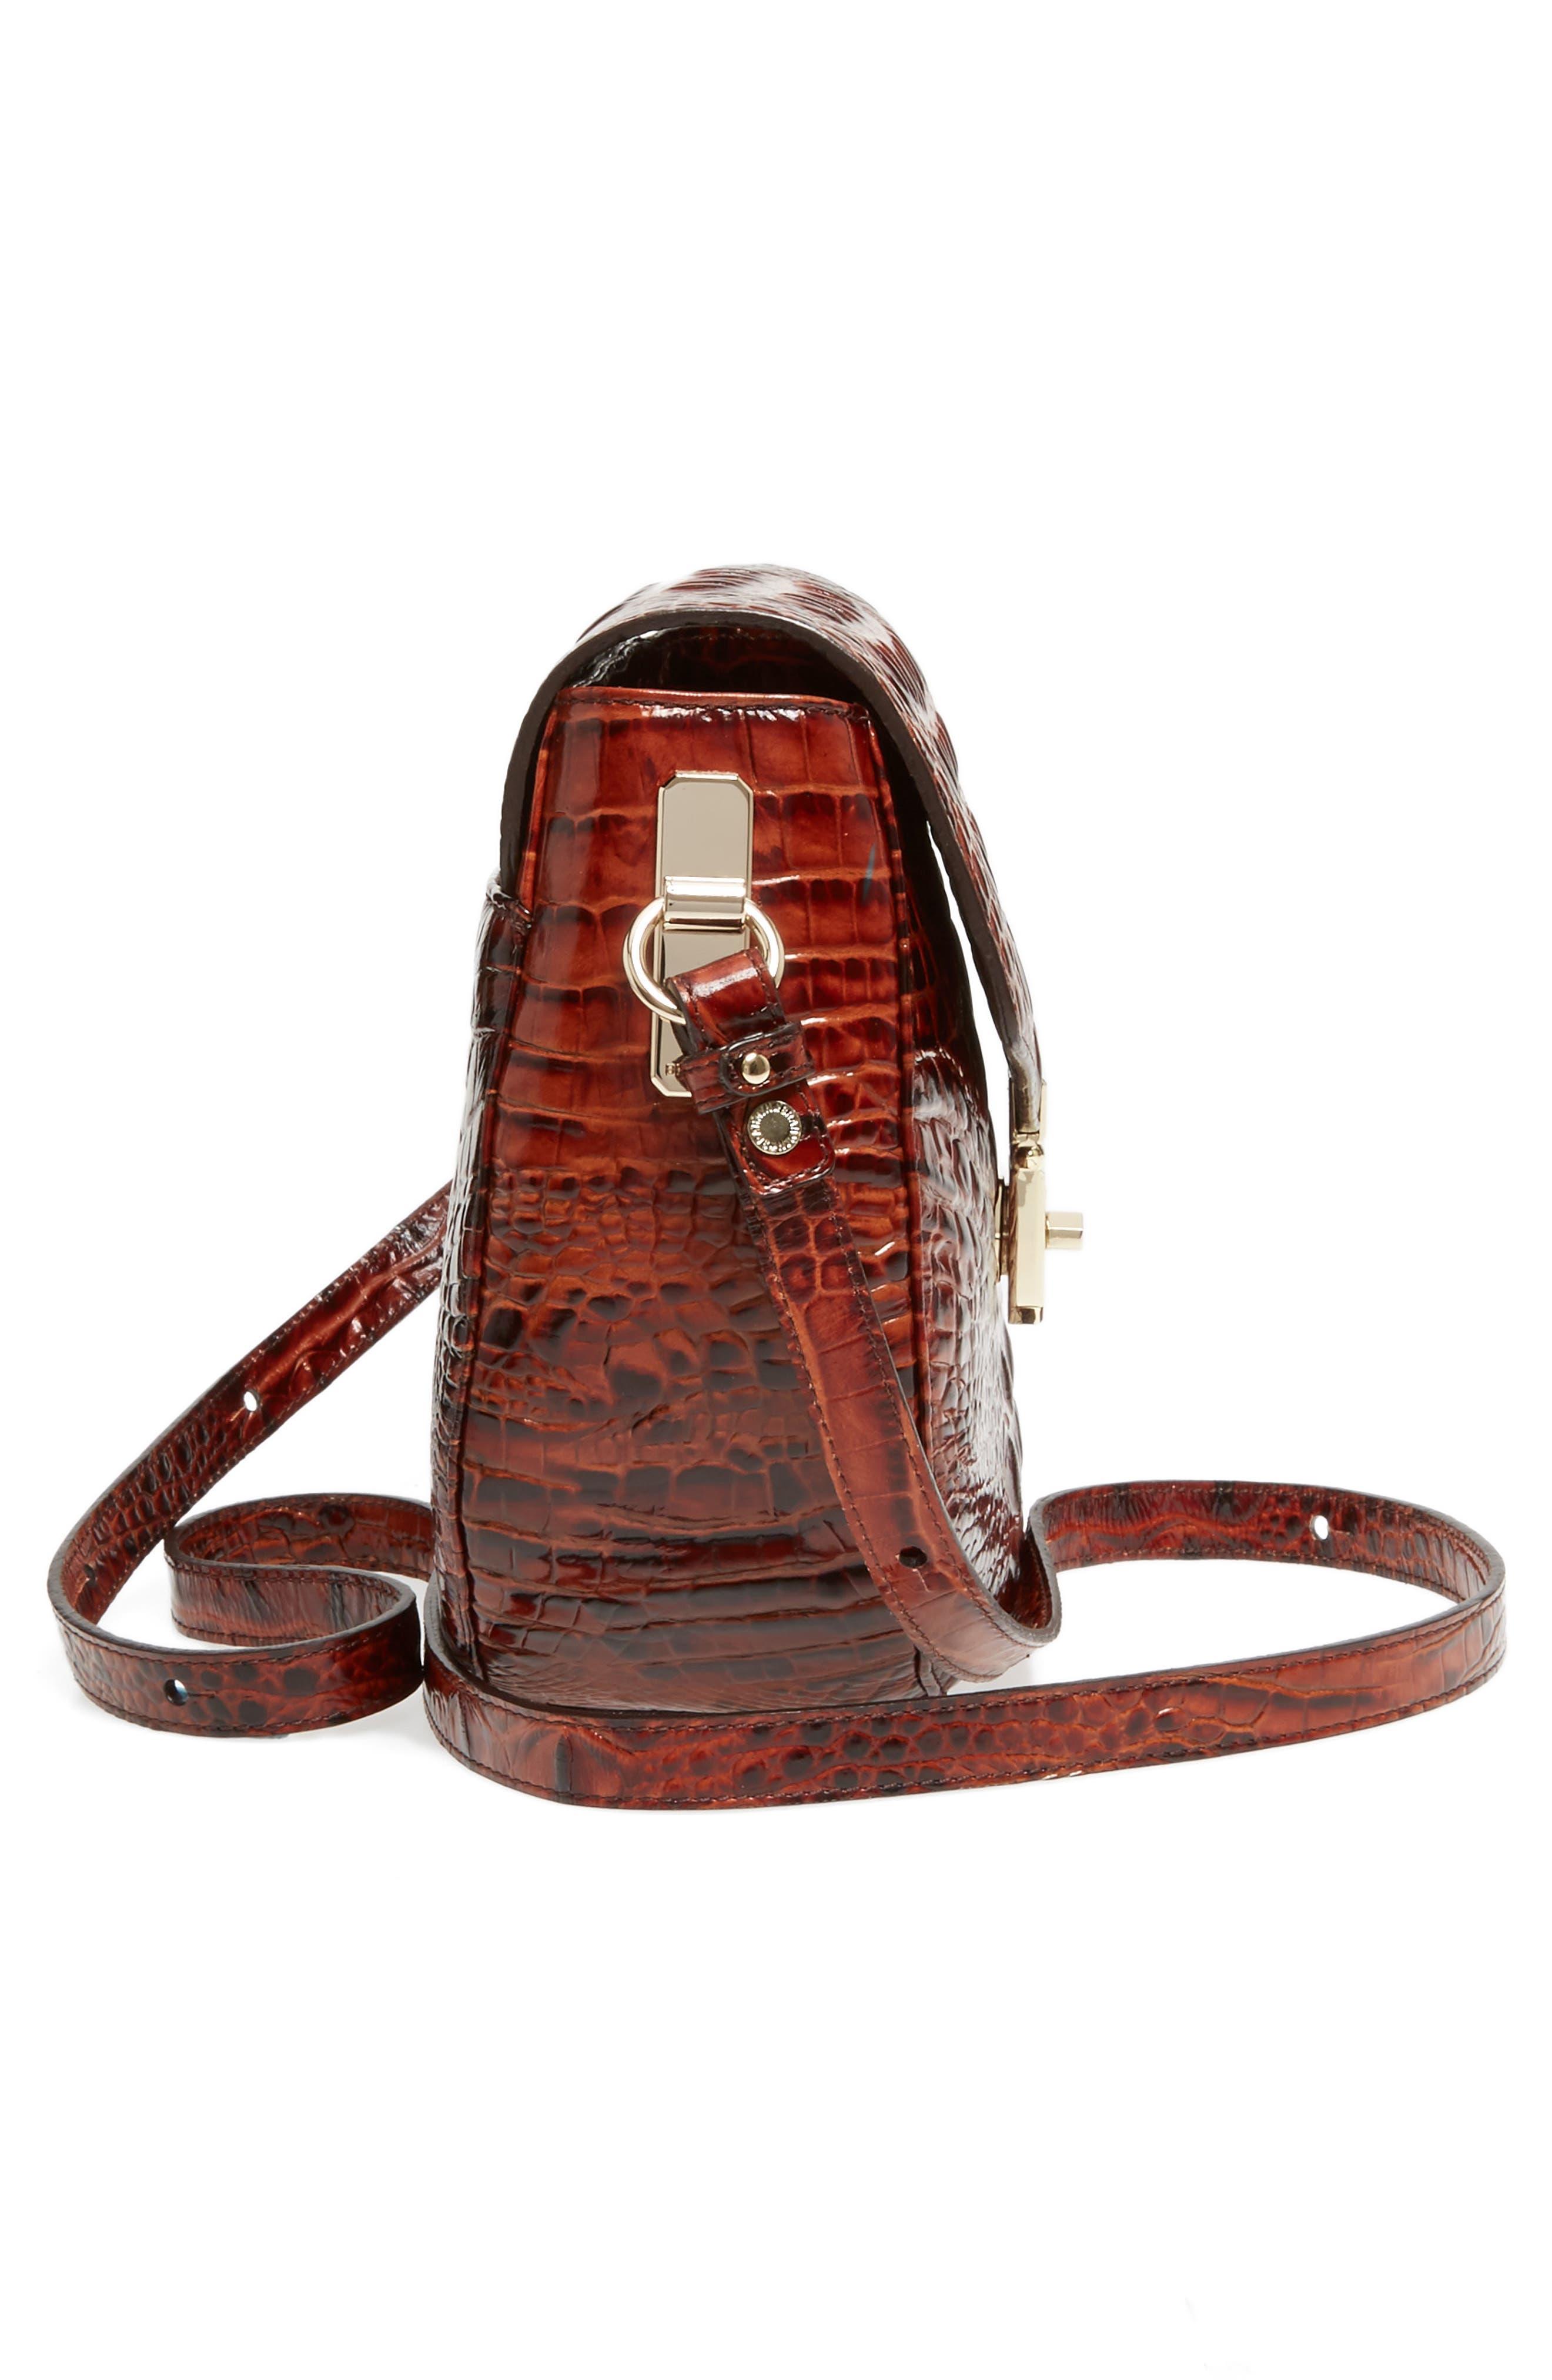 Melbourne - Lizzie Leather Crossbody Bag,                             Alternate thumbnail 22, color,